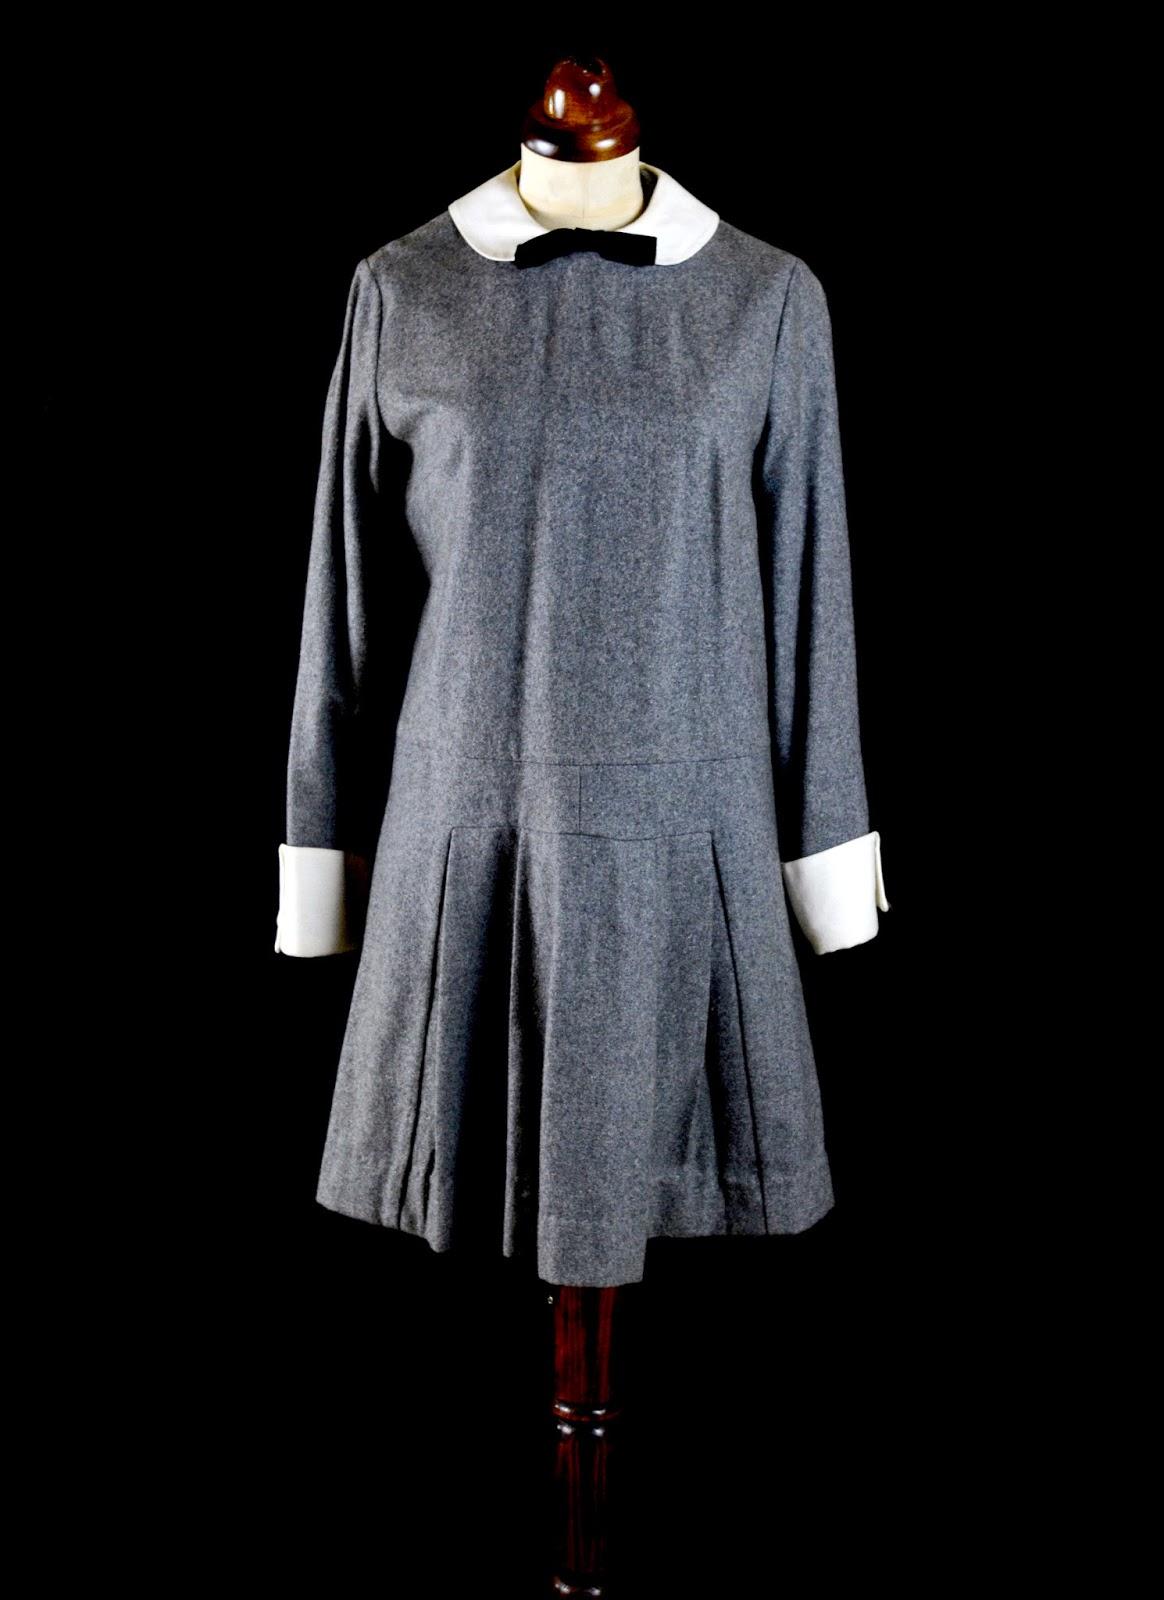 vintage mod dress